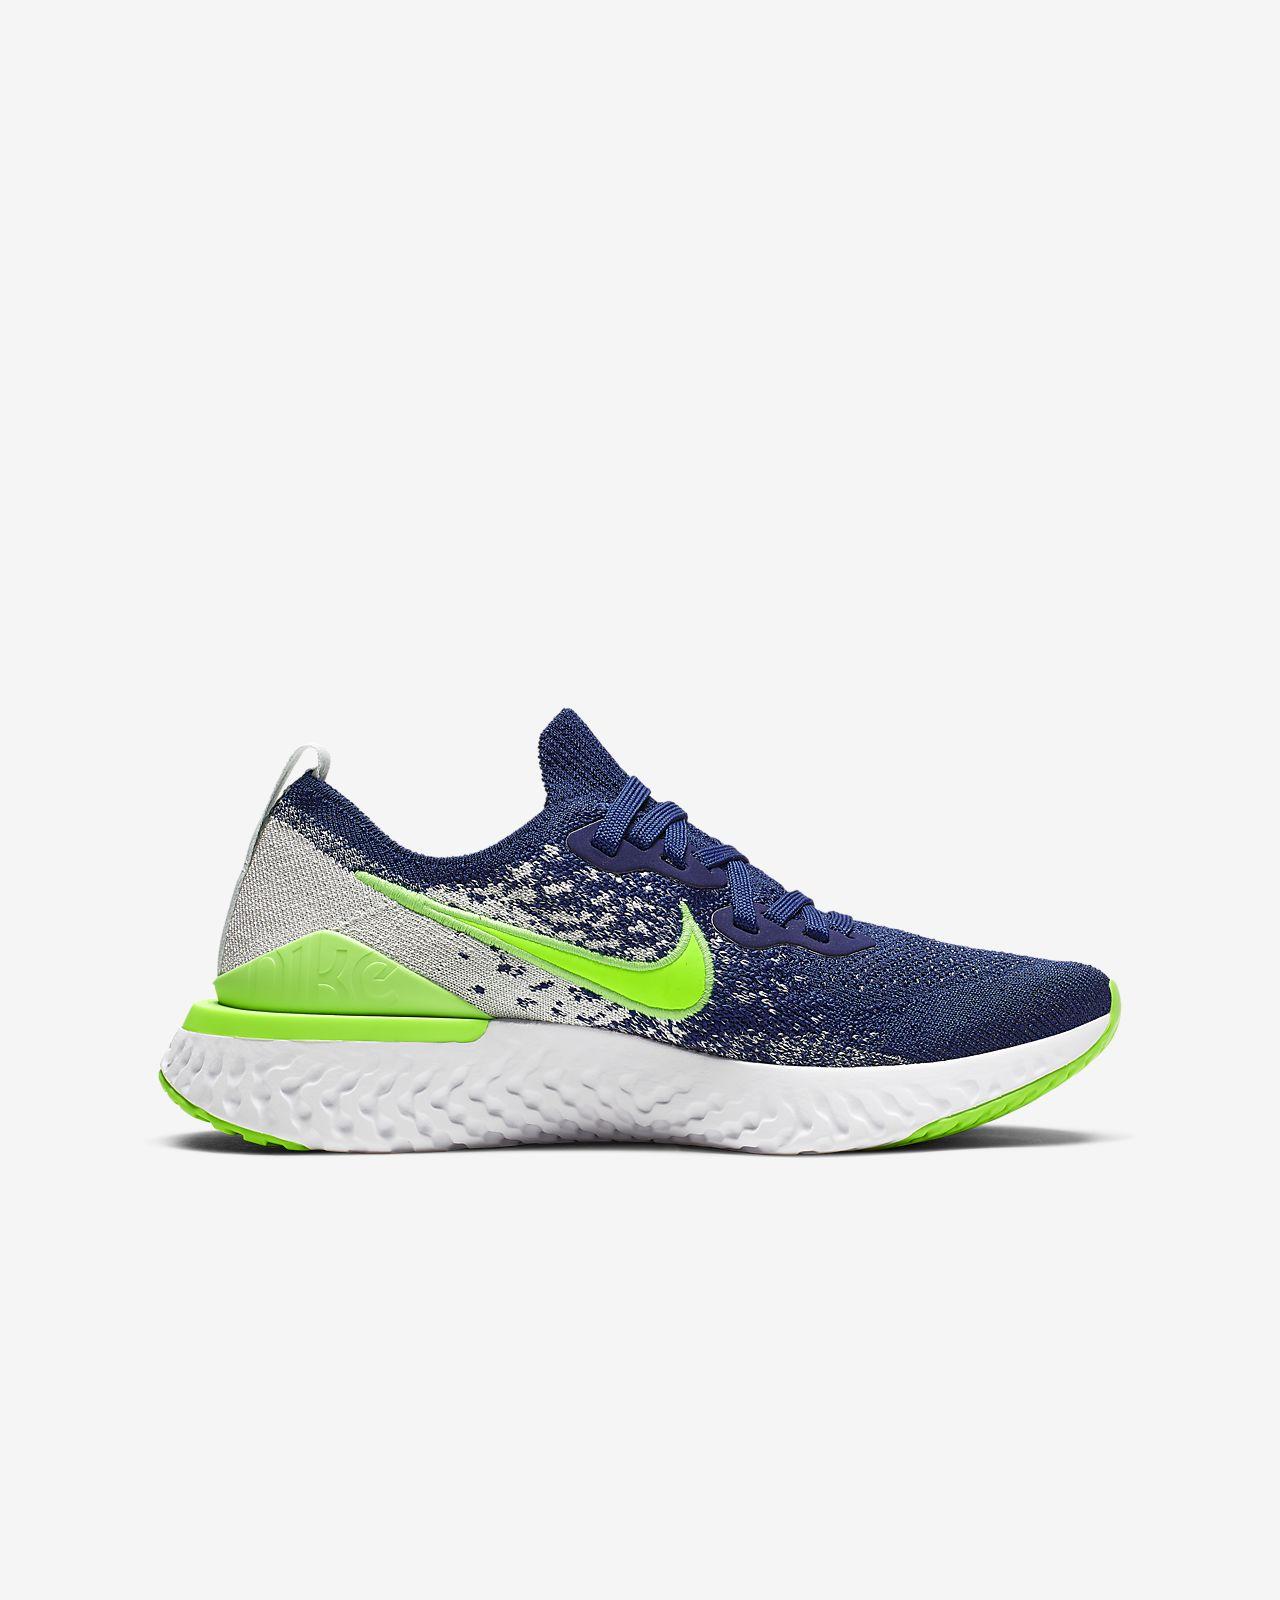 d7c5cc2cf8 Nike Epic React Flyknit 2 Big Kids' Running Shoe